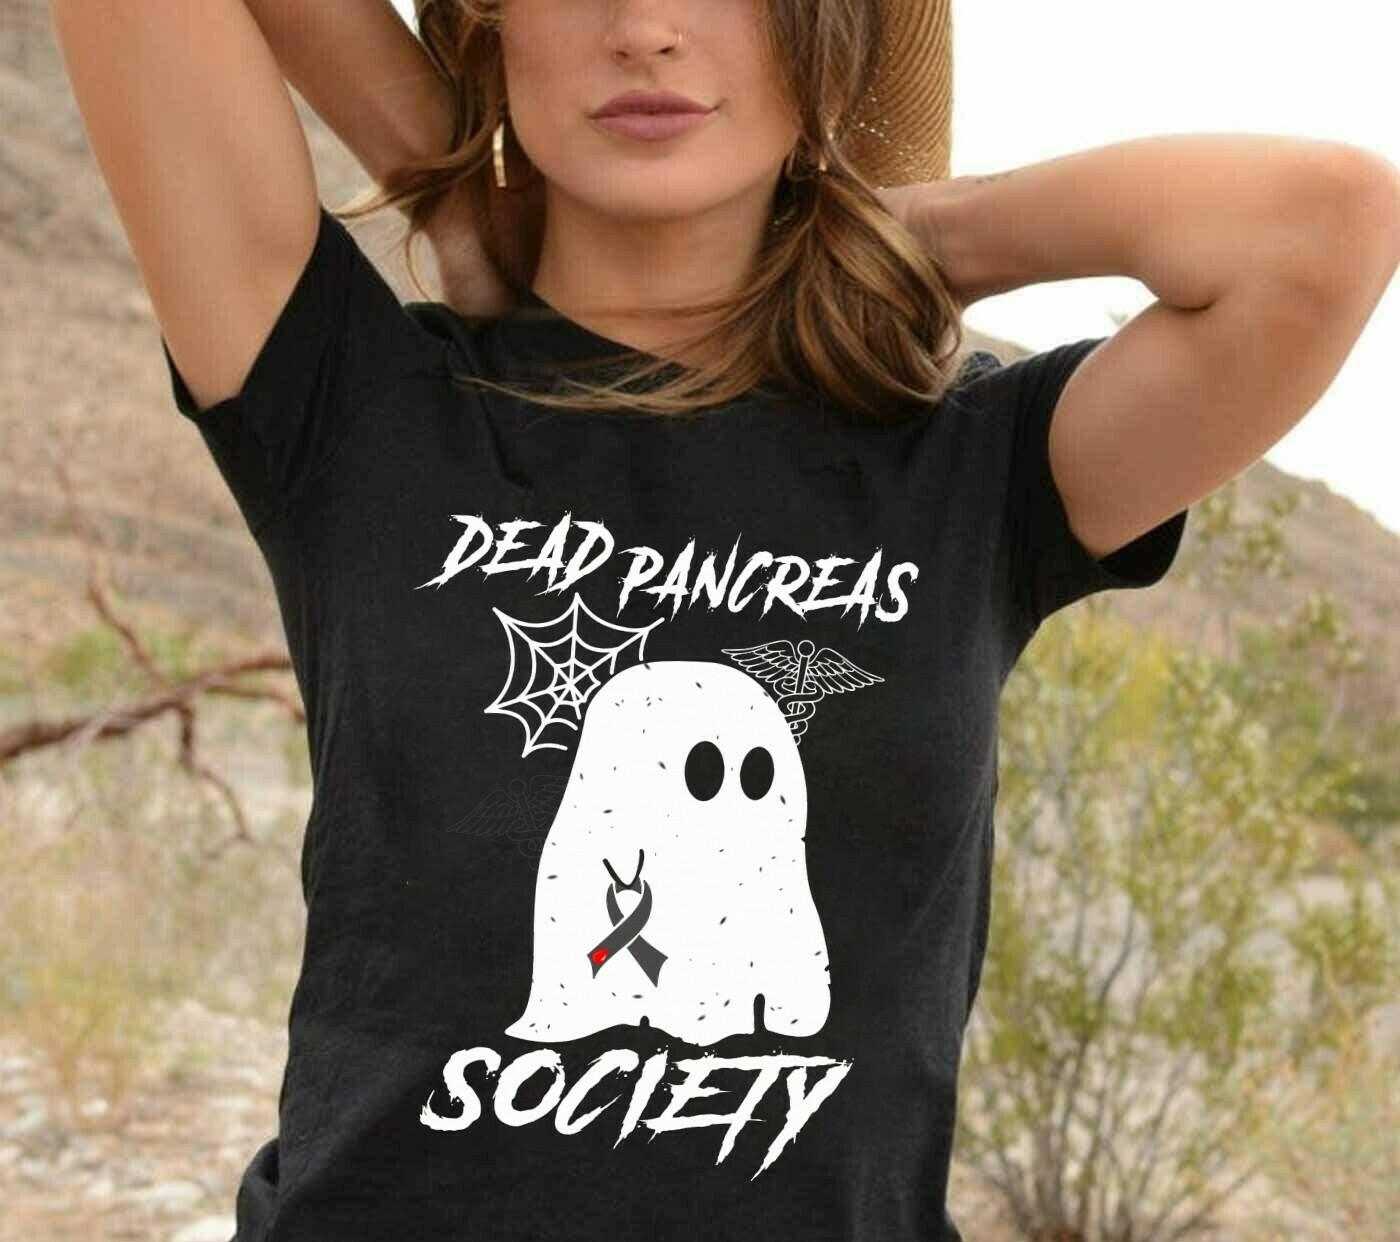 Dead Pancreas Society Pink Warrior Breast Cancer Awareness Survivor Ghost Boo Horror Halloween Horror Halloween Squad T Shirt Long Sleeve Sweatshirt Hoodie Jolly Family Gifts